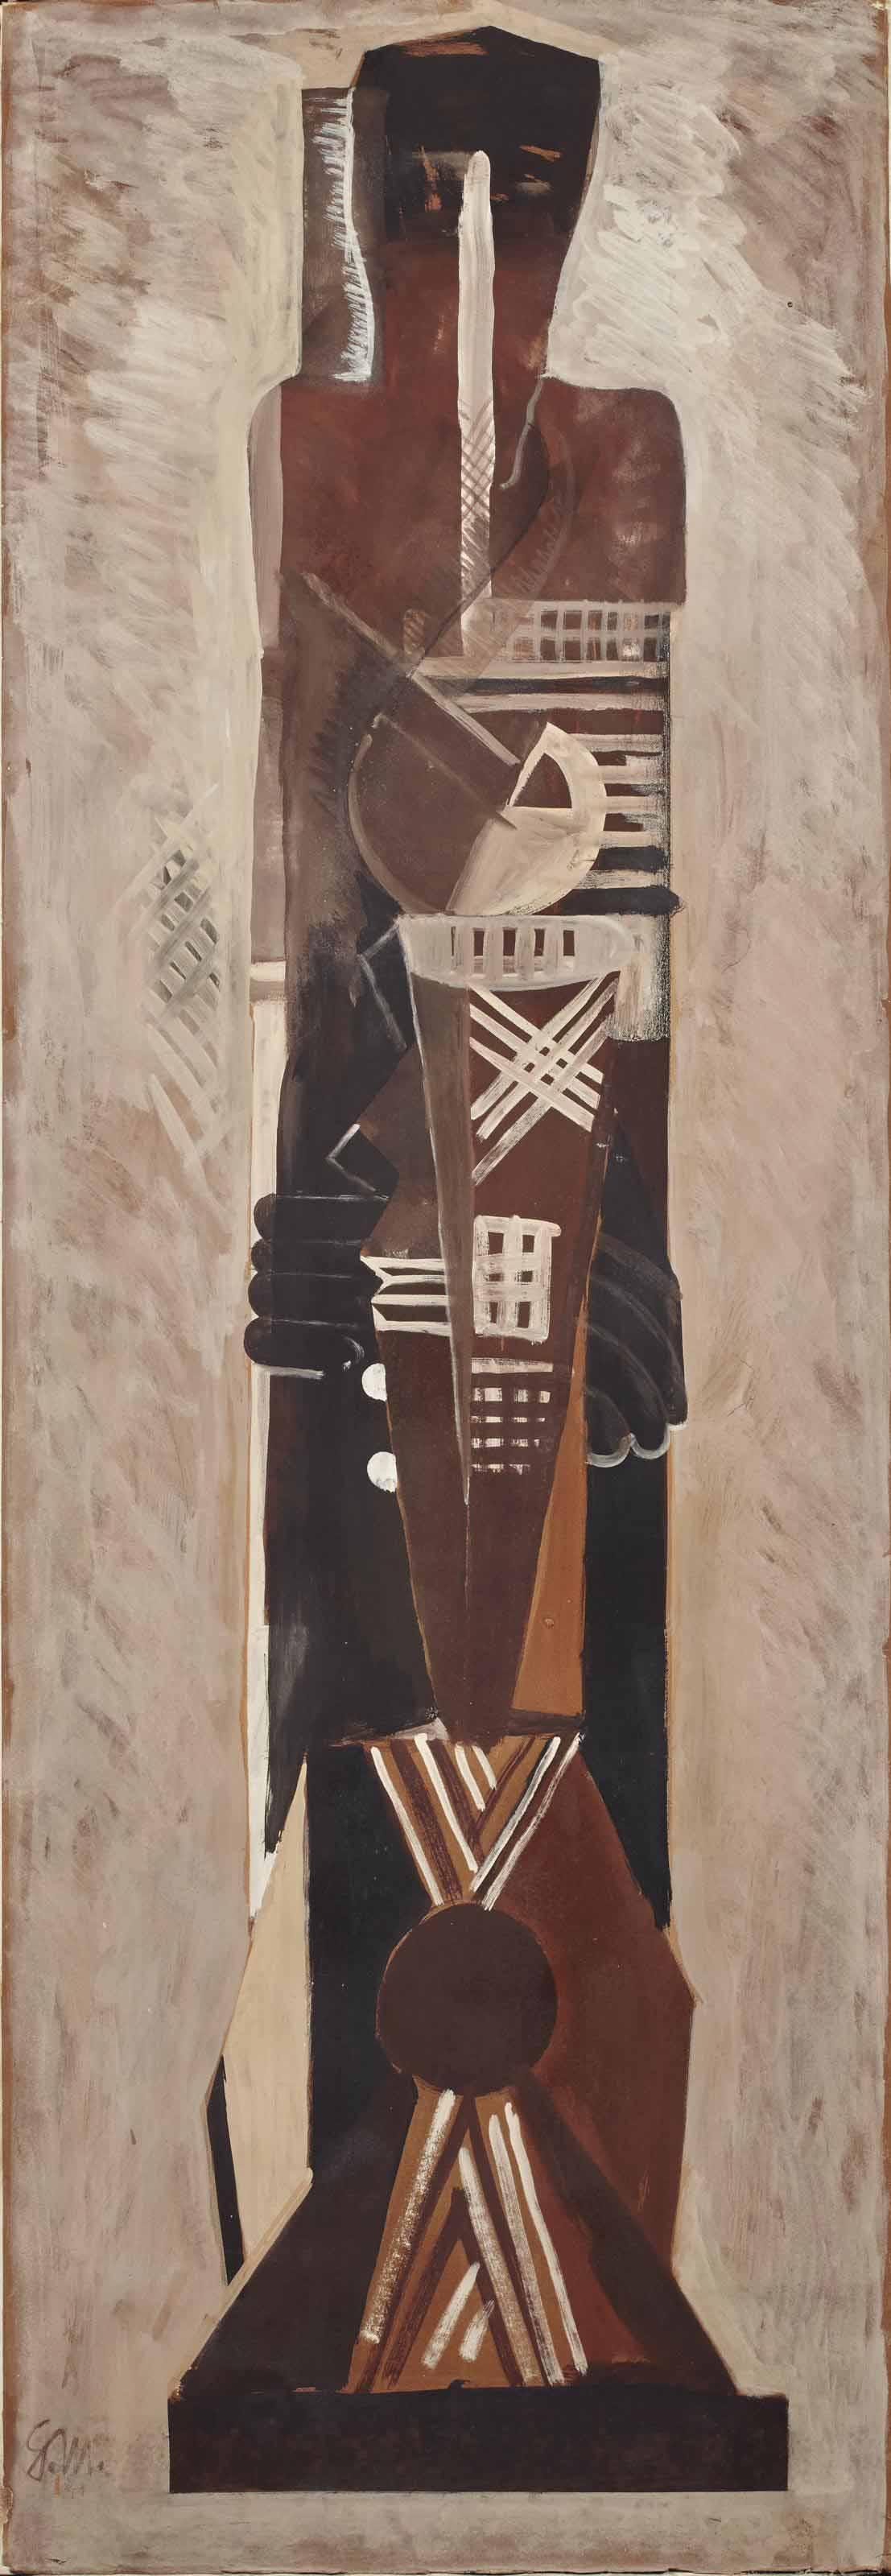 GUSTAVE MIKLOS (1888-1967)